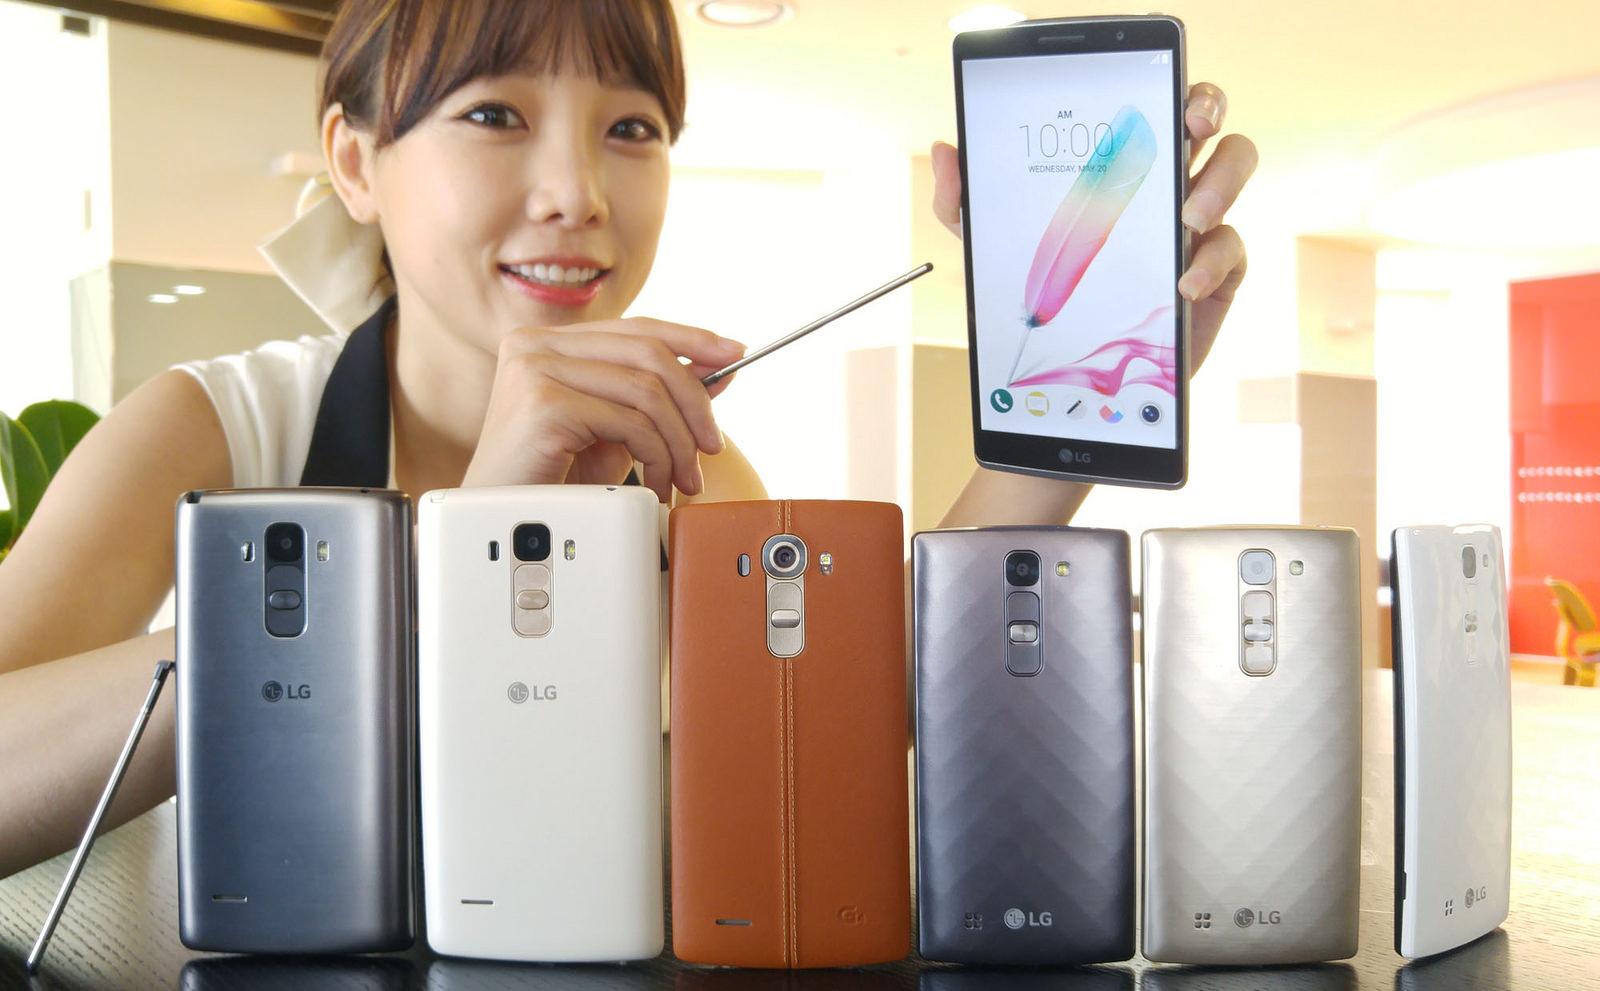 Harga LG G4 Stylus bulan Oktober 2015